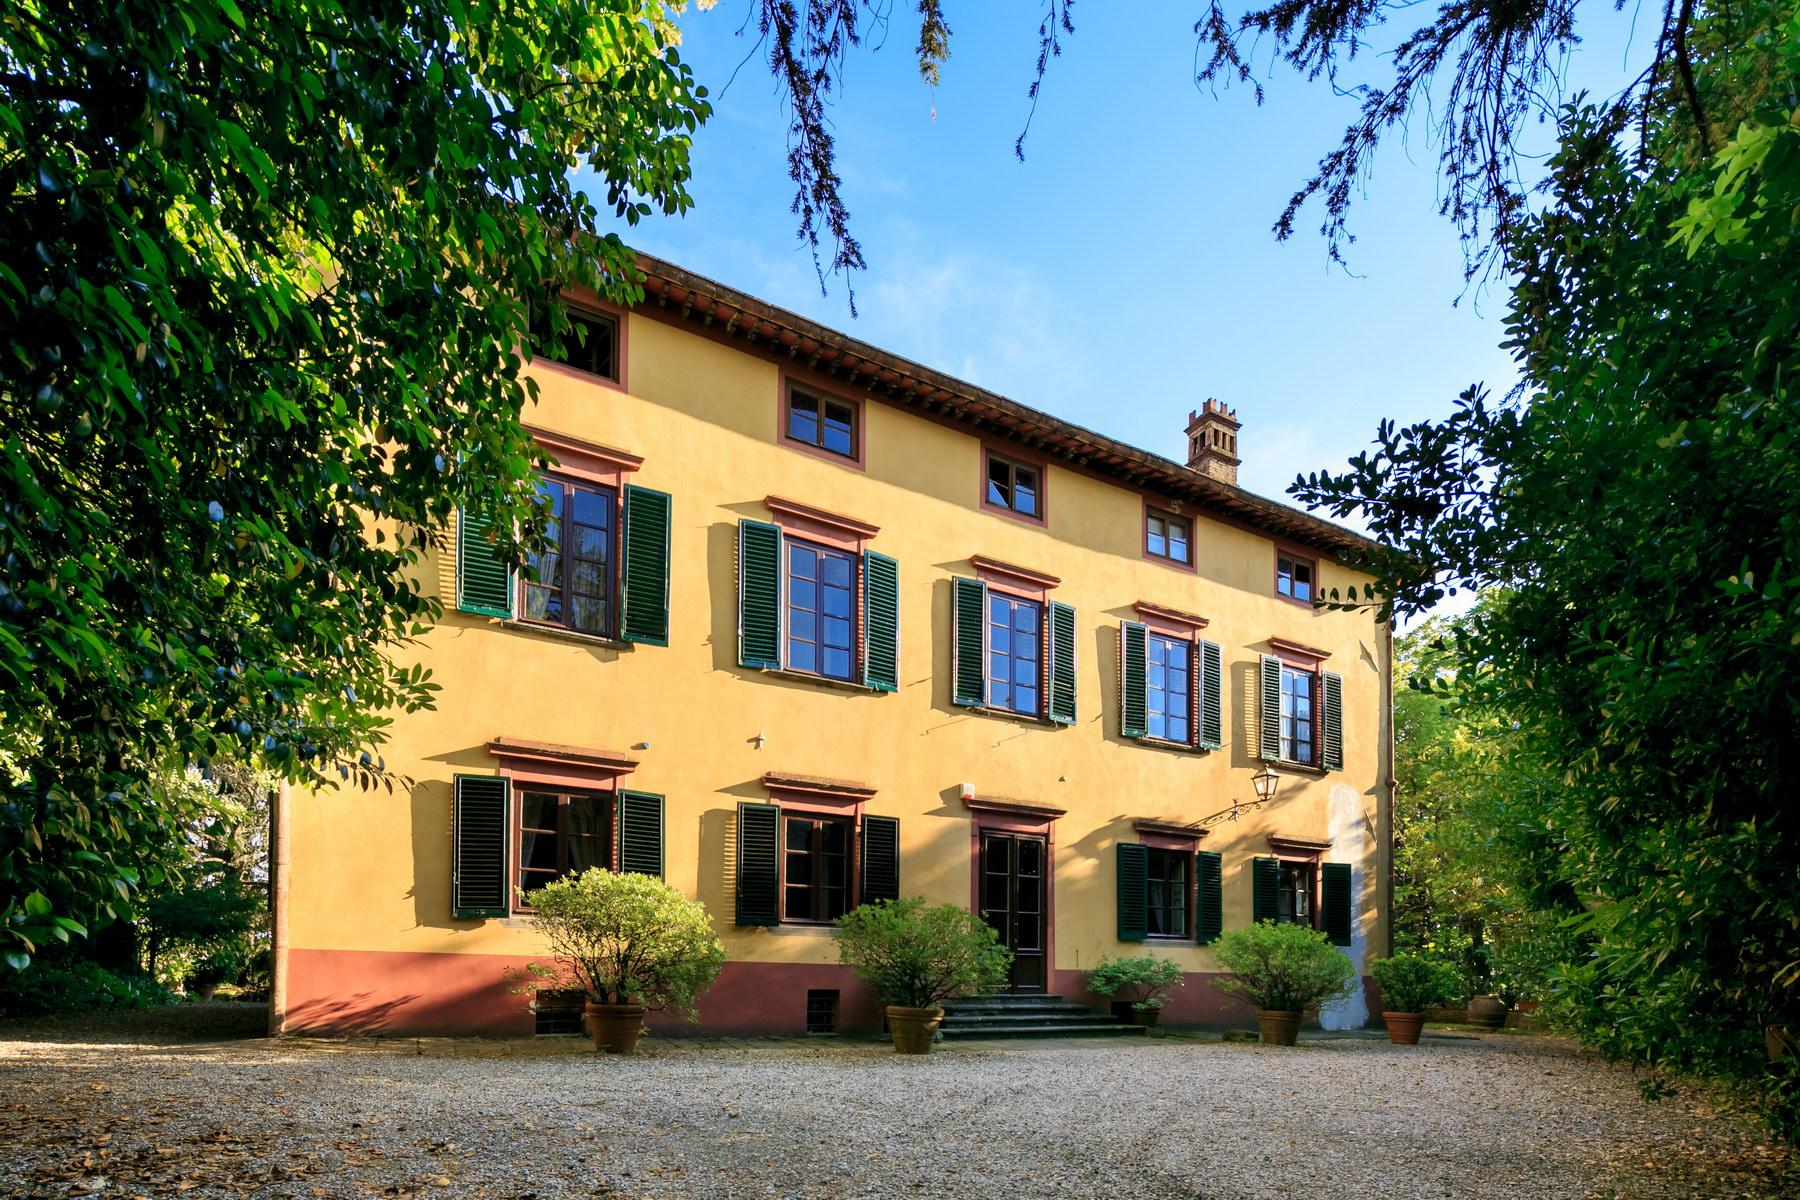 Villa in Vendita a Capannori: 5 locali, 570 mq - Foto 23